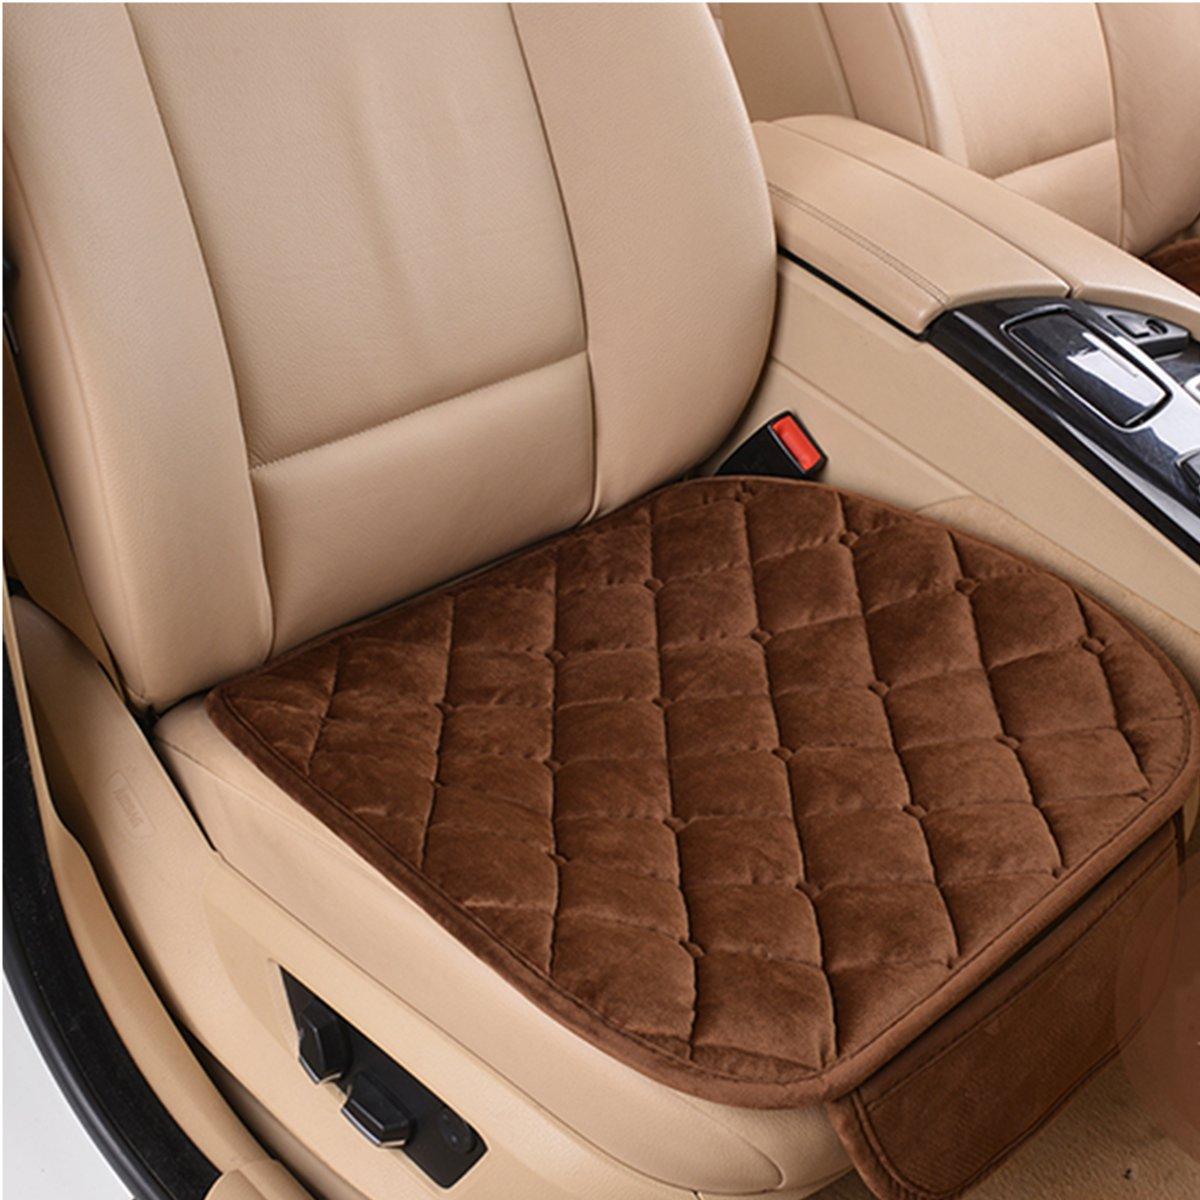 new plush anti slip car seat cover small mat rhombus pattern auto chair cushion ebay. Black Bedroom Furniture Sets. Home Design Ideas